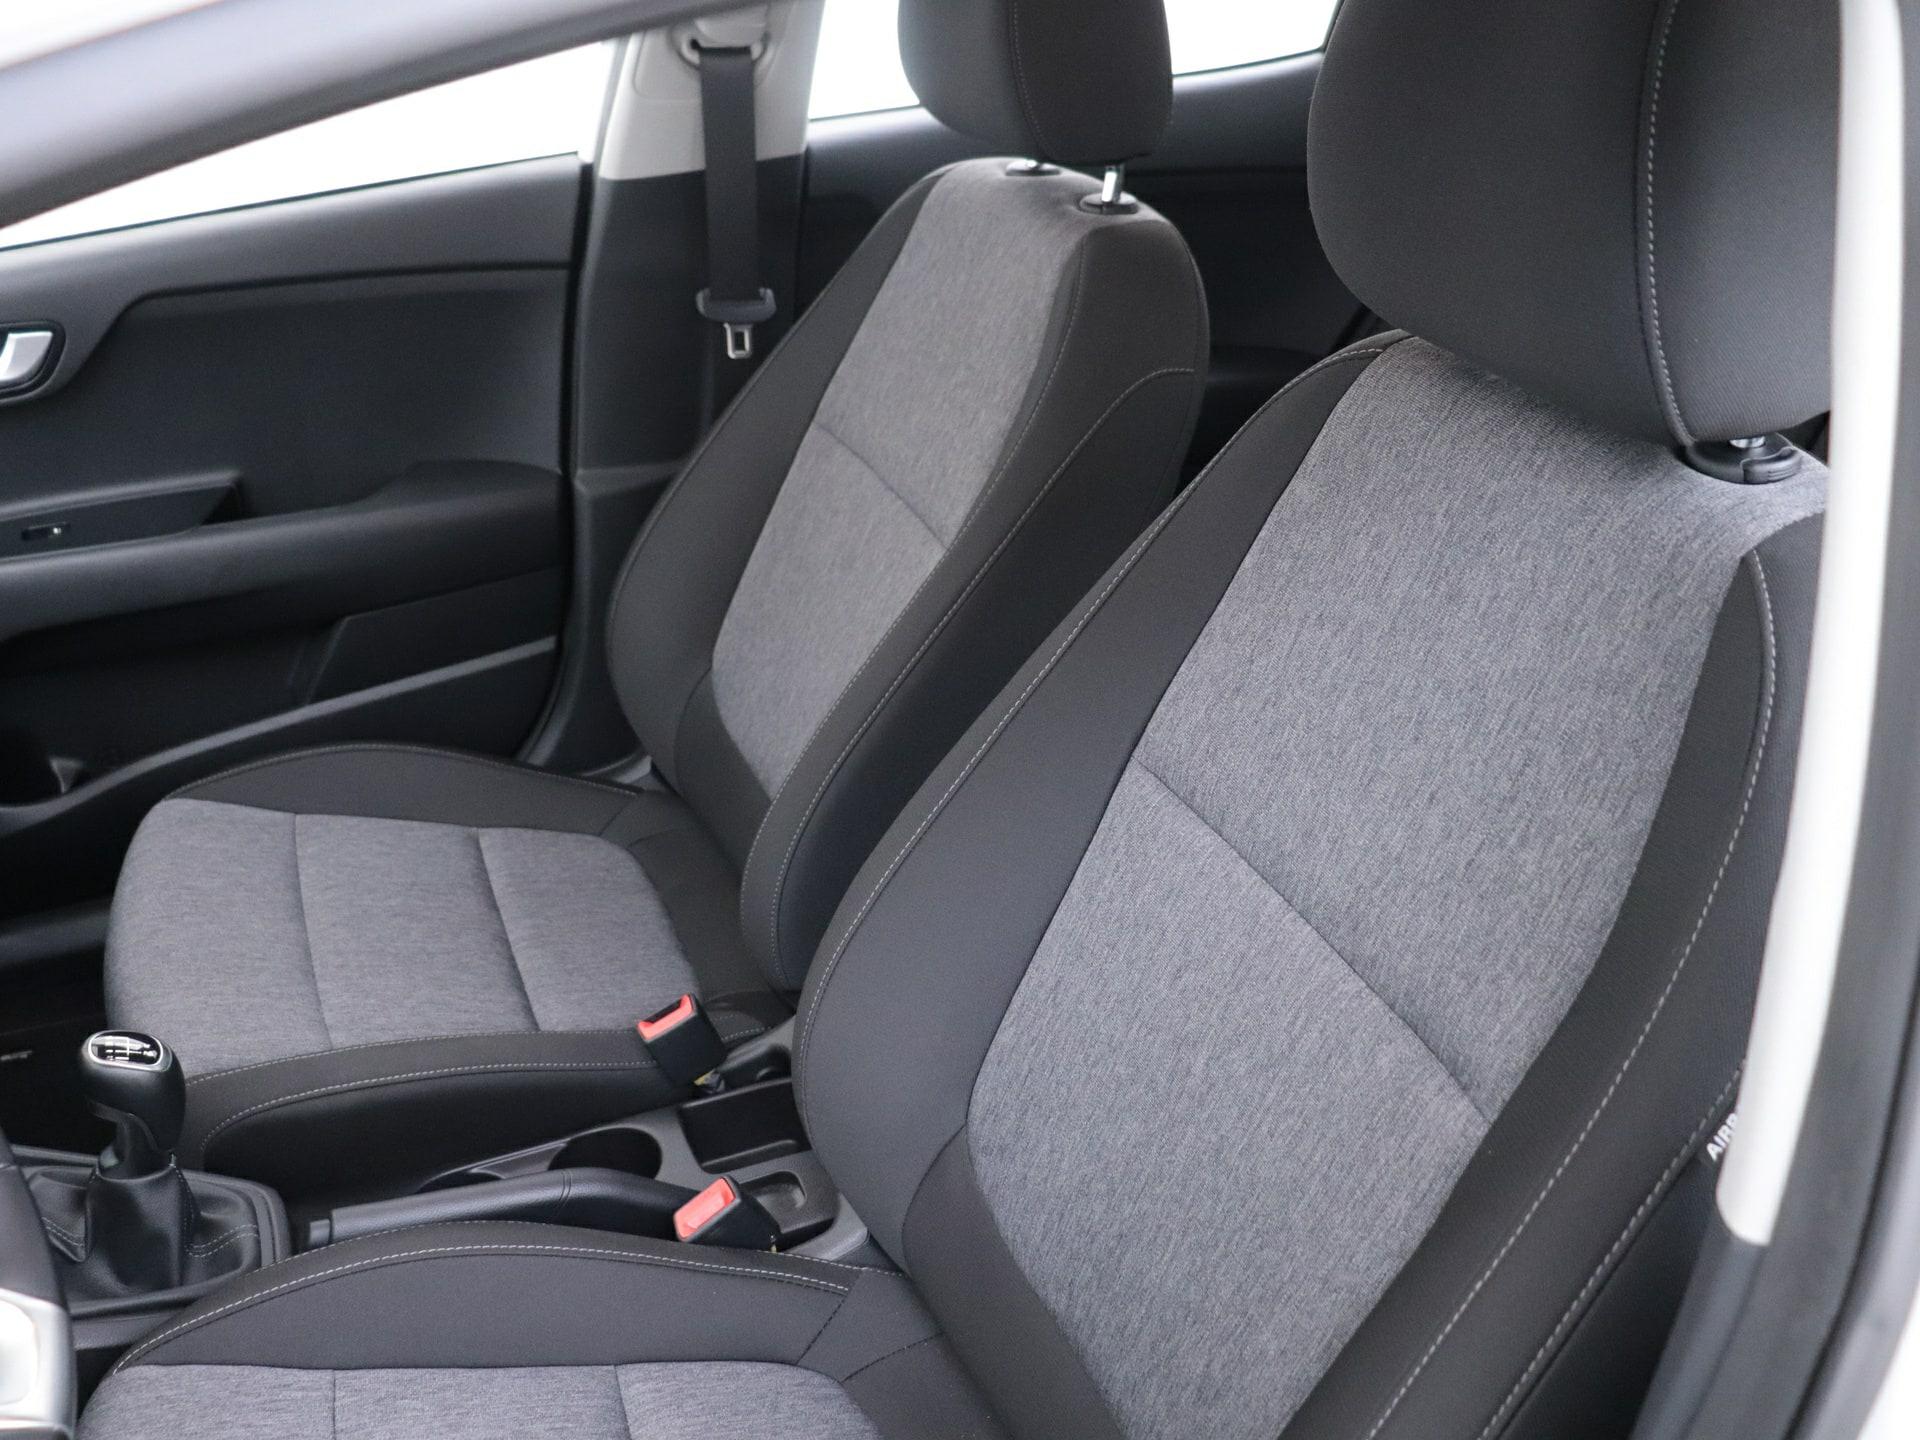 Kia Stonic 1.0 T-GDI van CarSelexy.